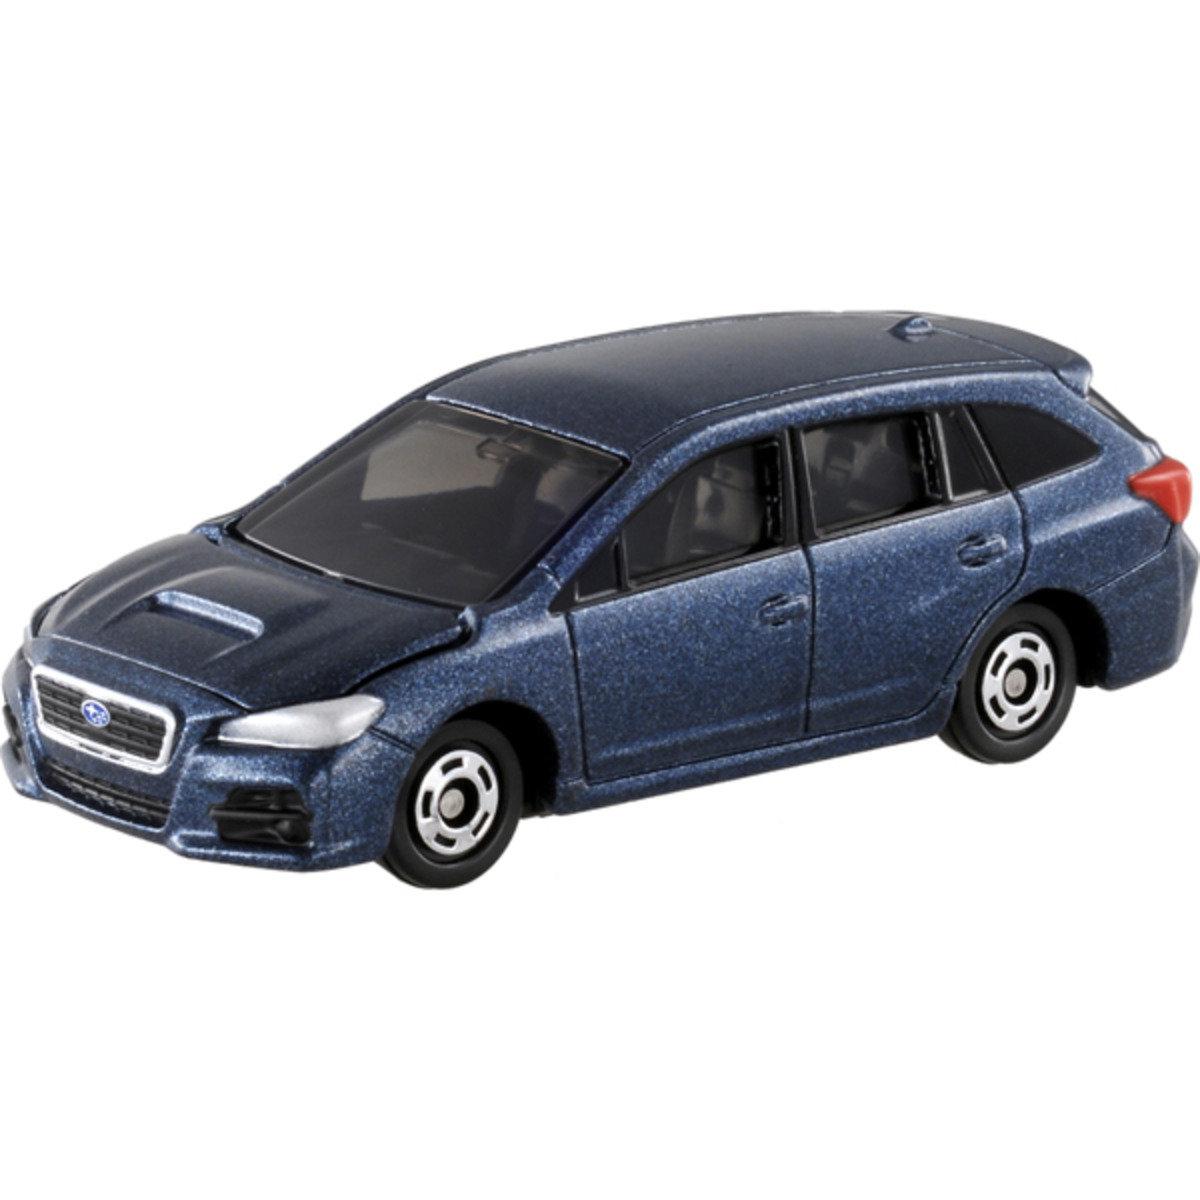 Tomy 78 Subaru Levorg 1/65 Blue